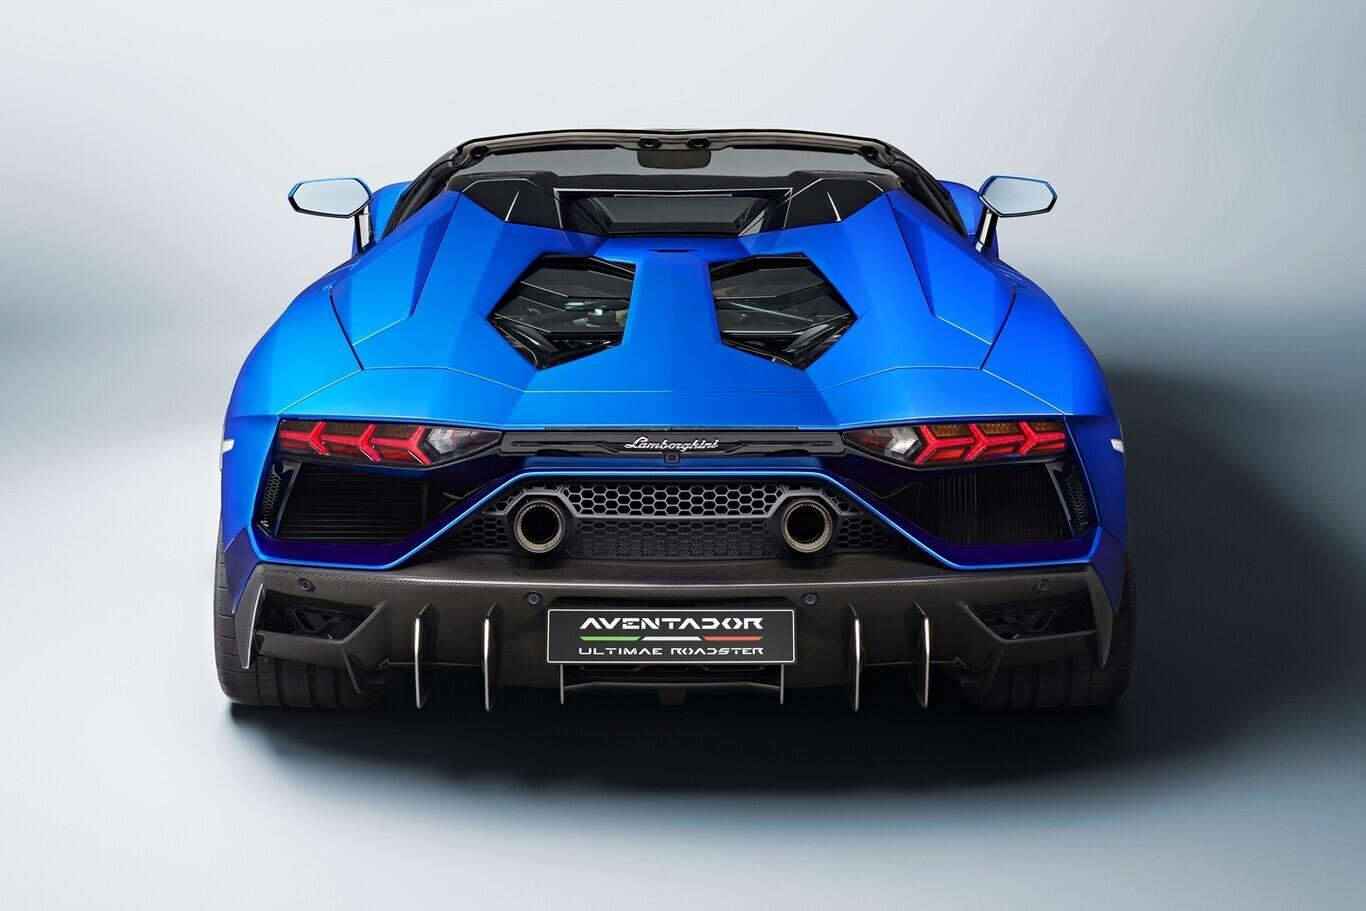 Foto de Lamborghini Aventador LP780-4 Ultimae (15/18)